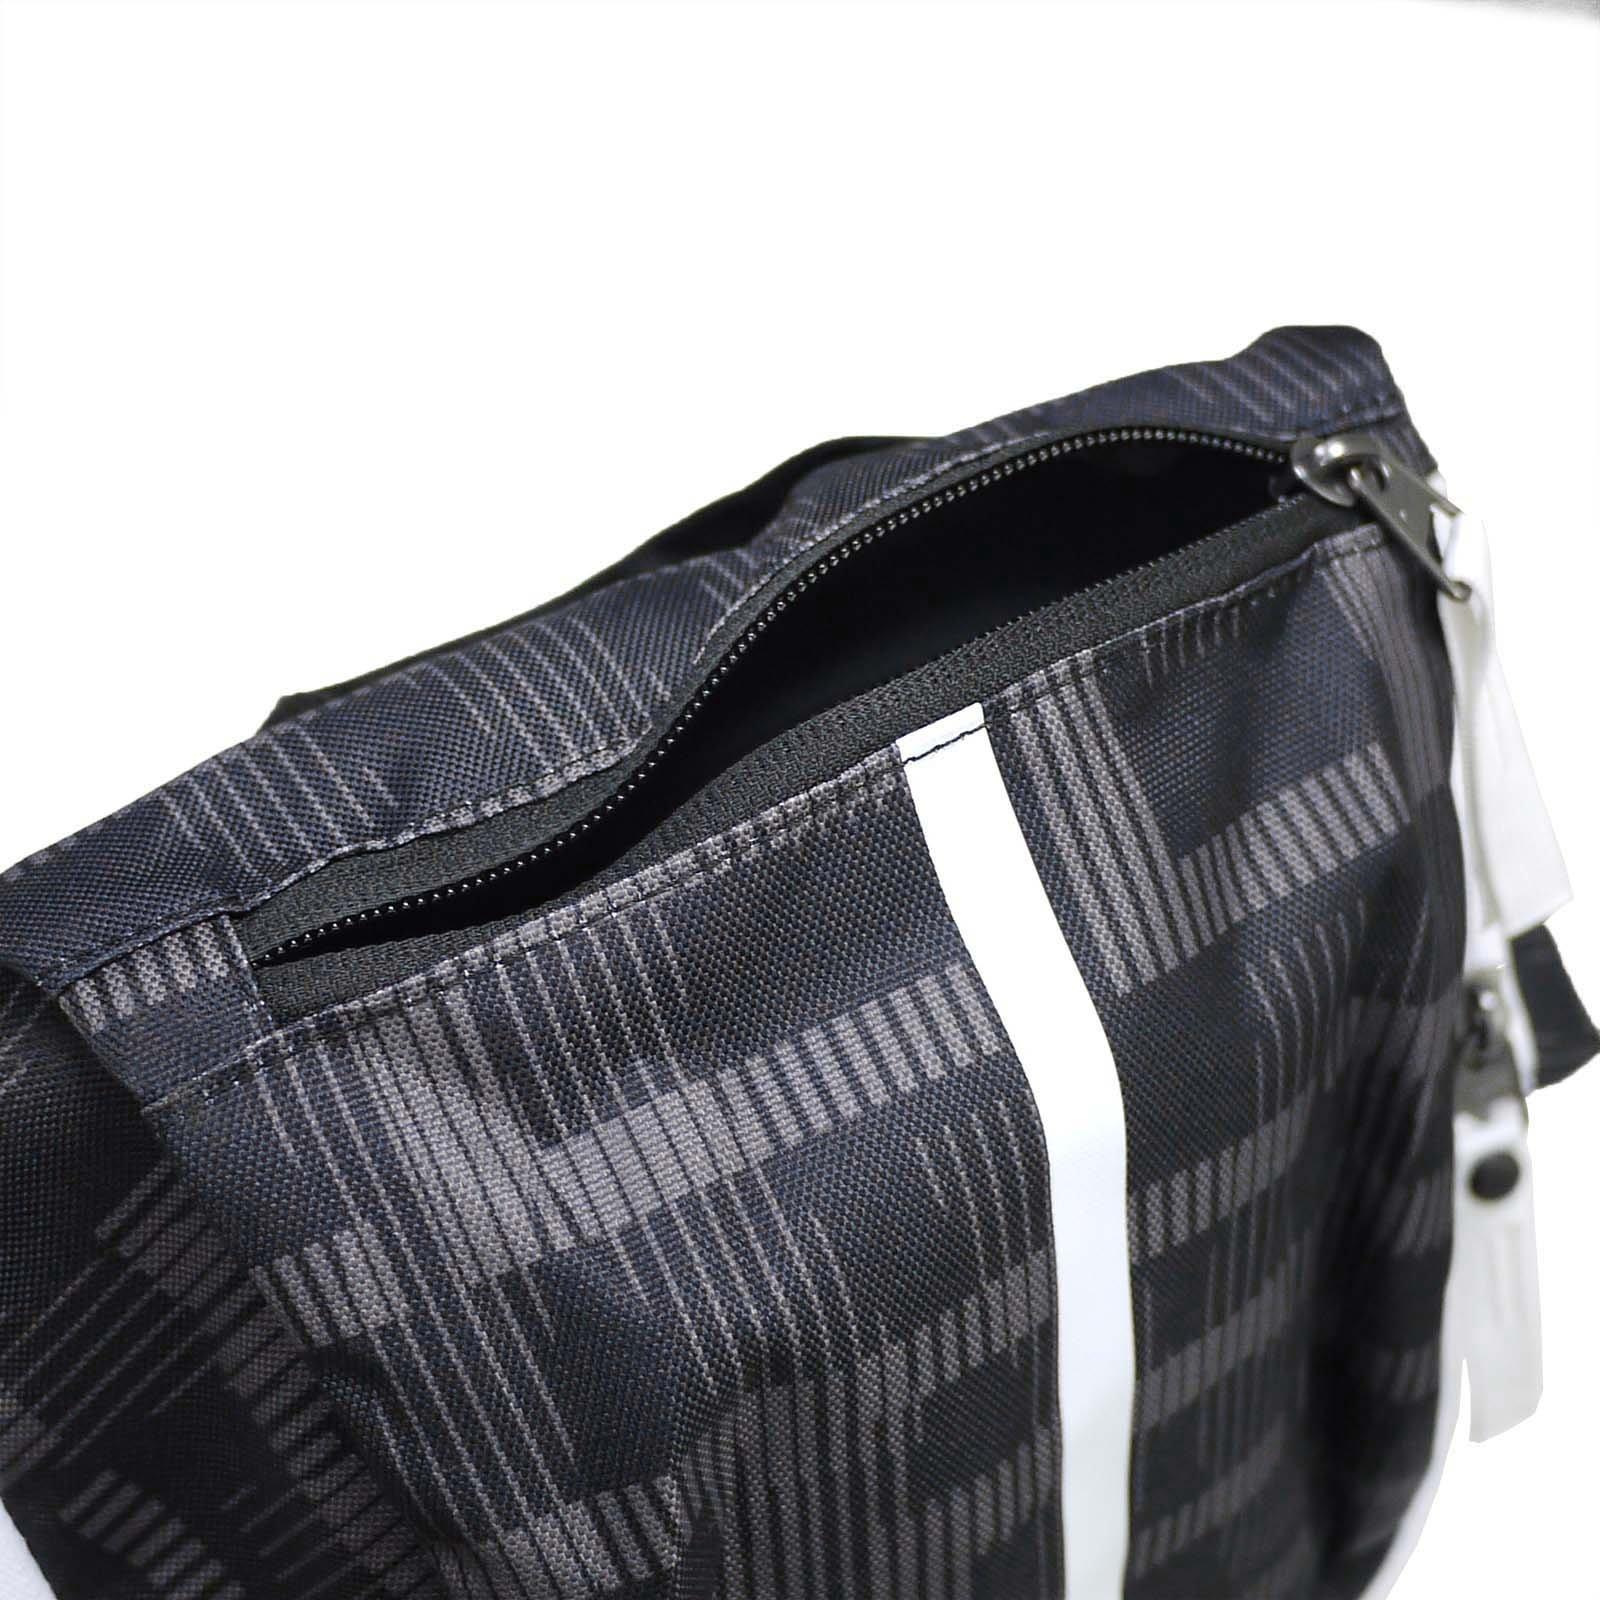 Nike Hoops Elite Max Air Team 2.0 Graphic Basketball Backpack Black/White by NIKE (Image #5)